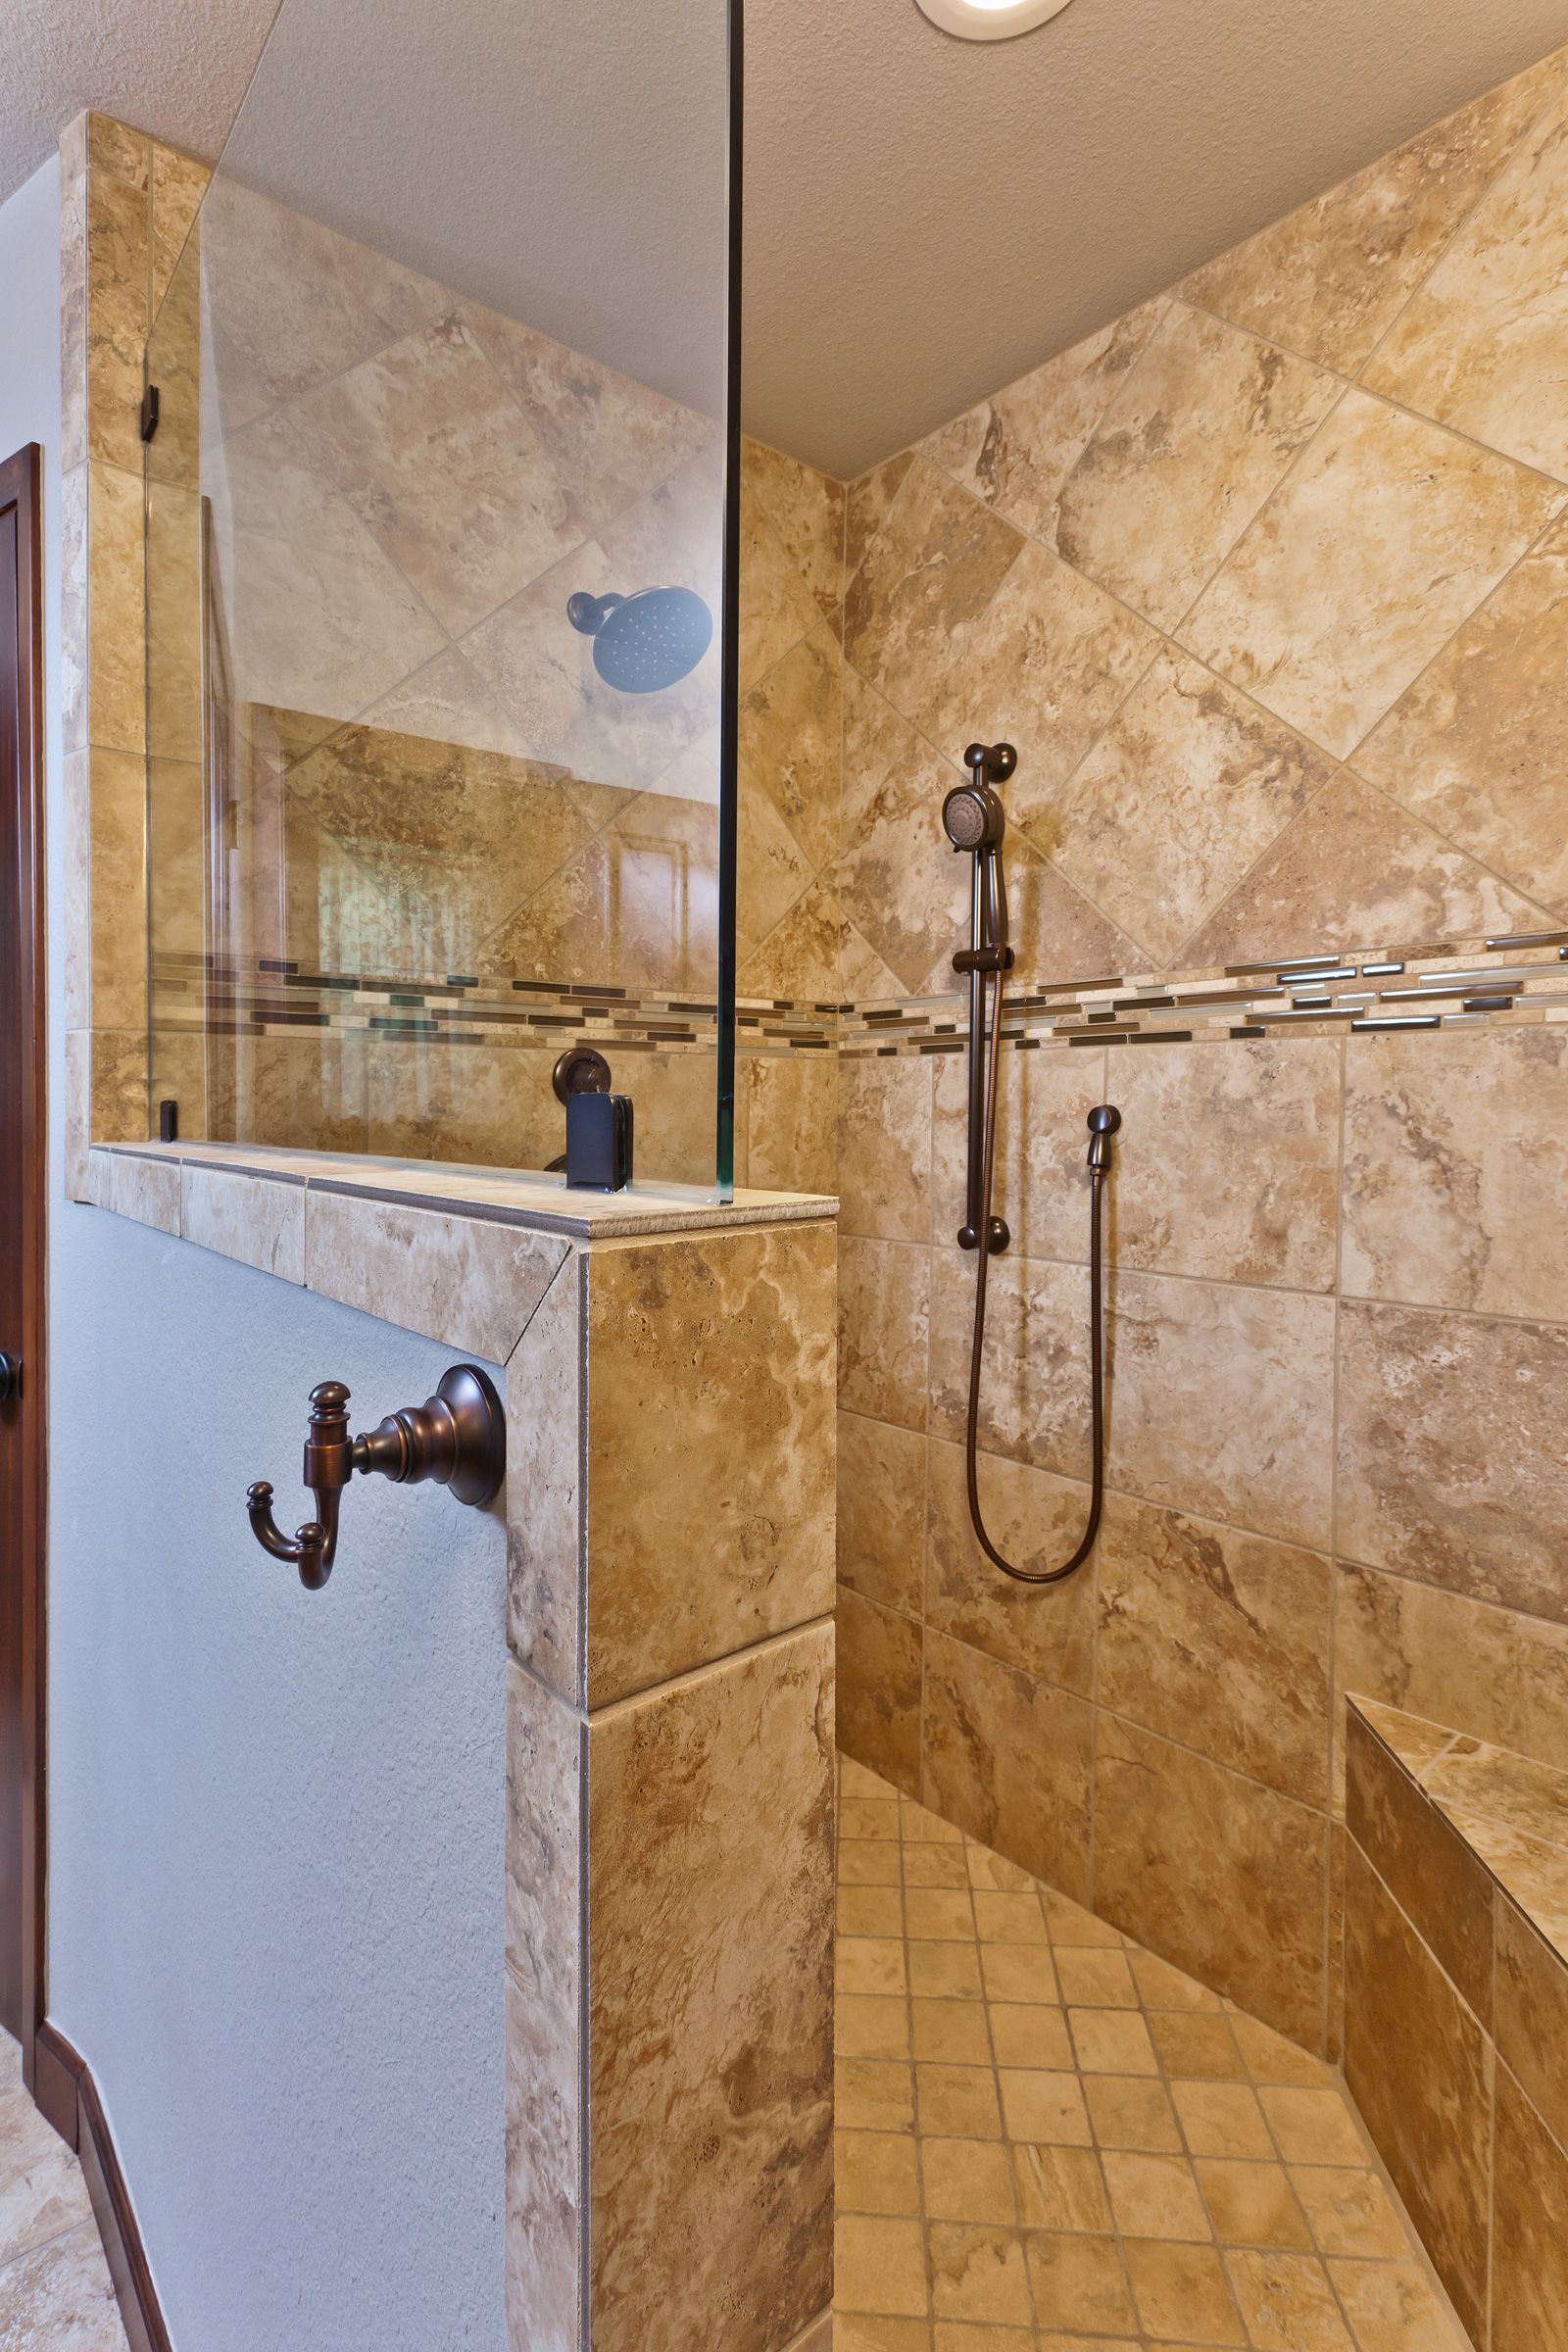 Kalinowski Master Bath Remodel Beautiful walk in shower with tile